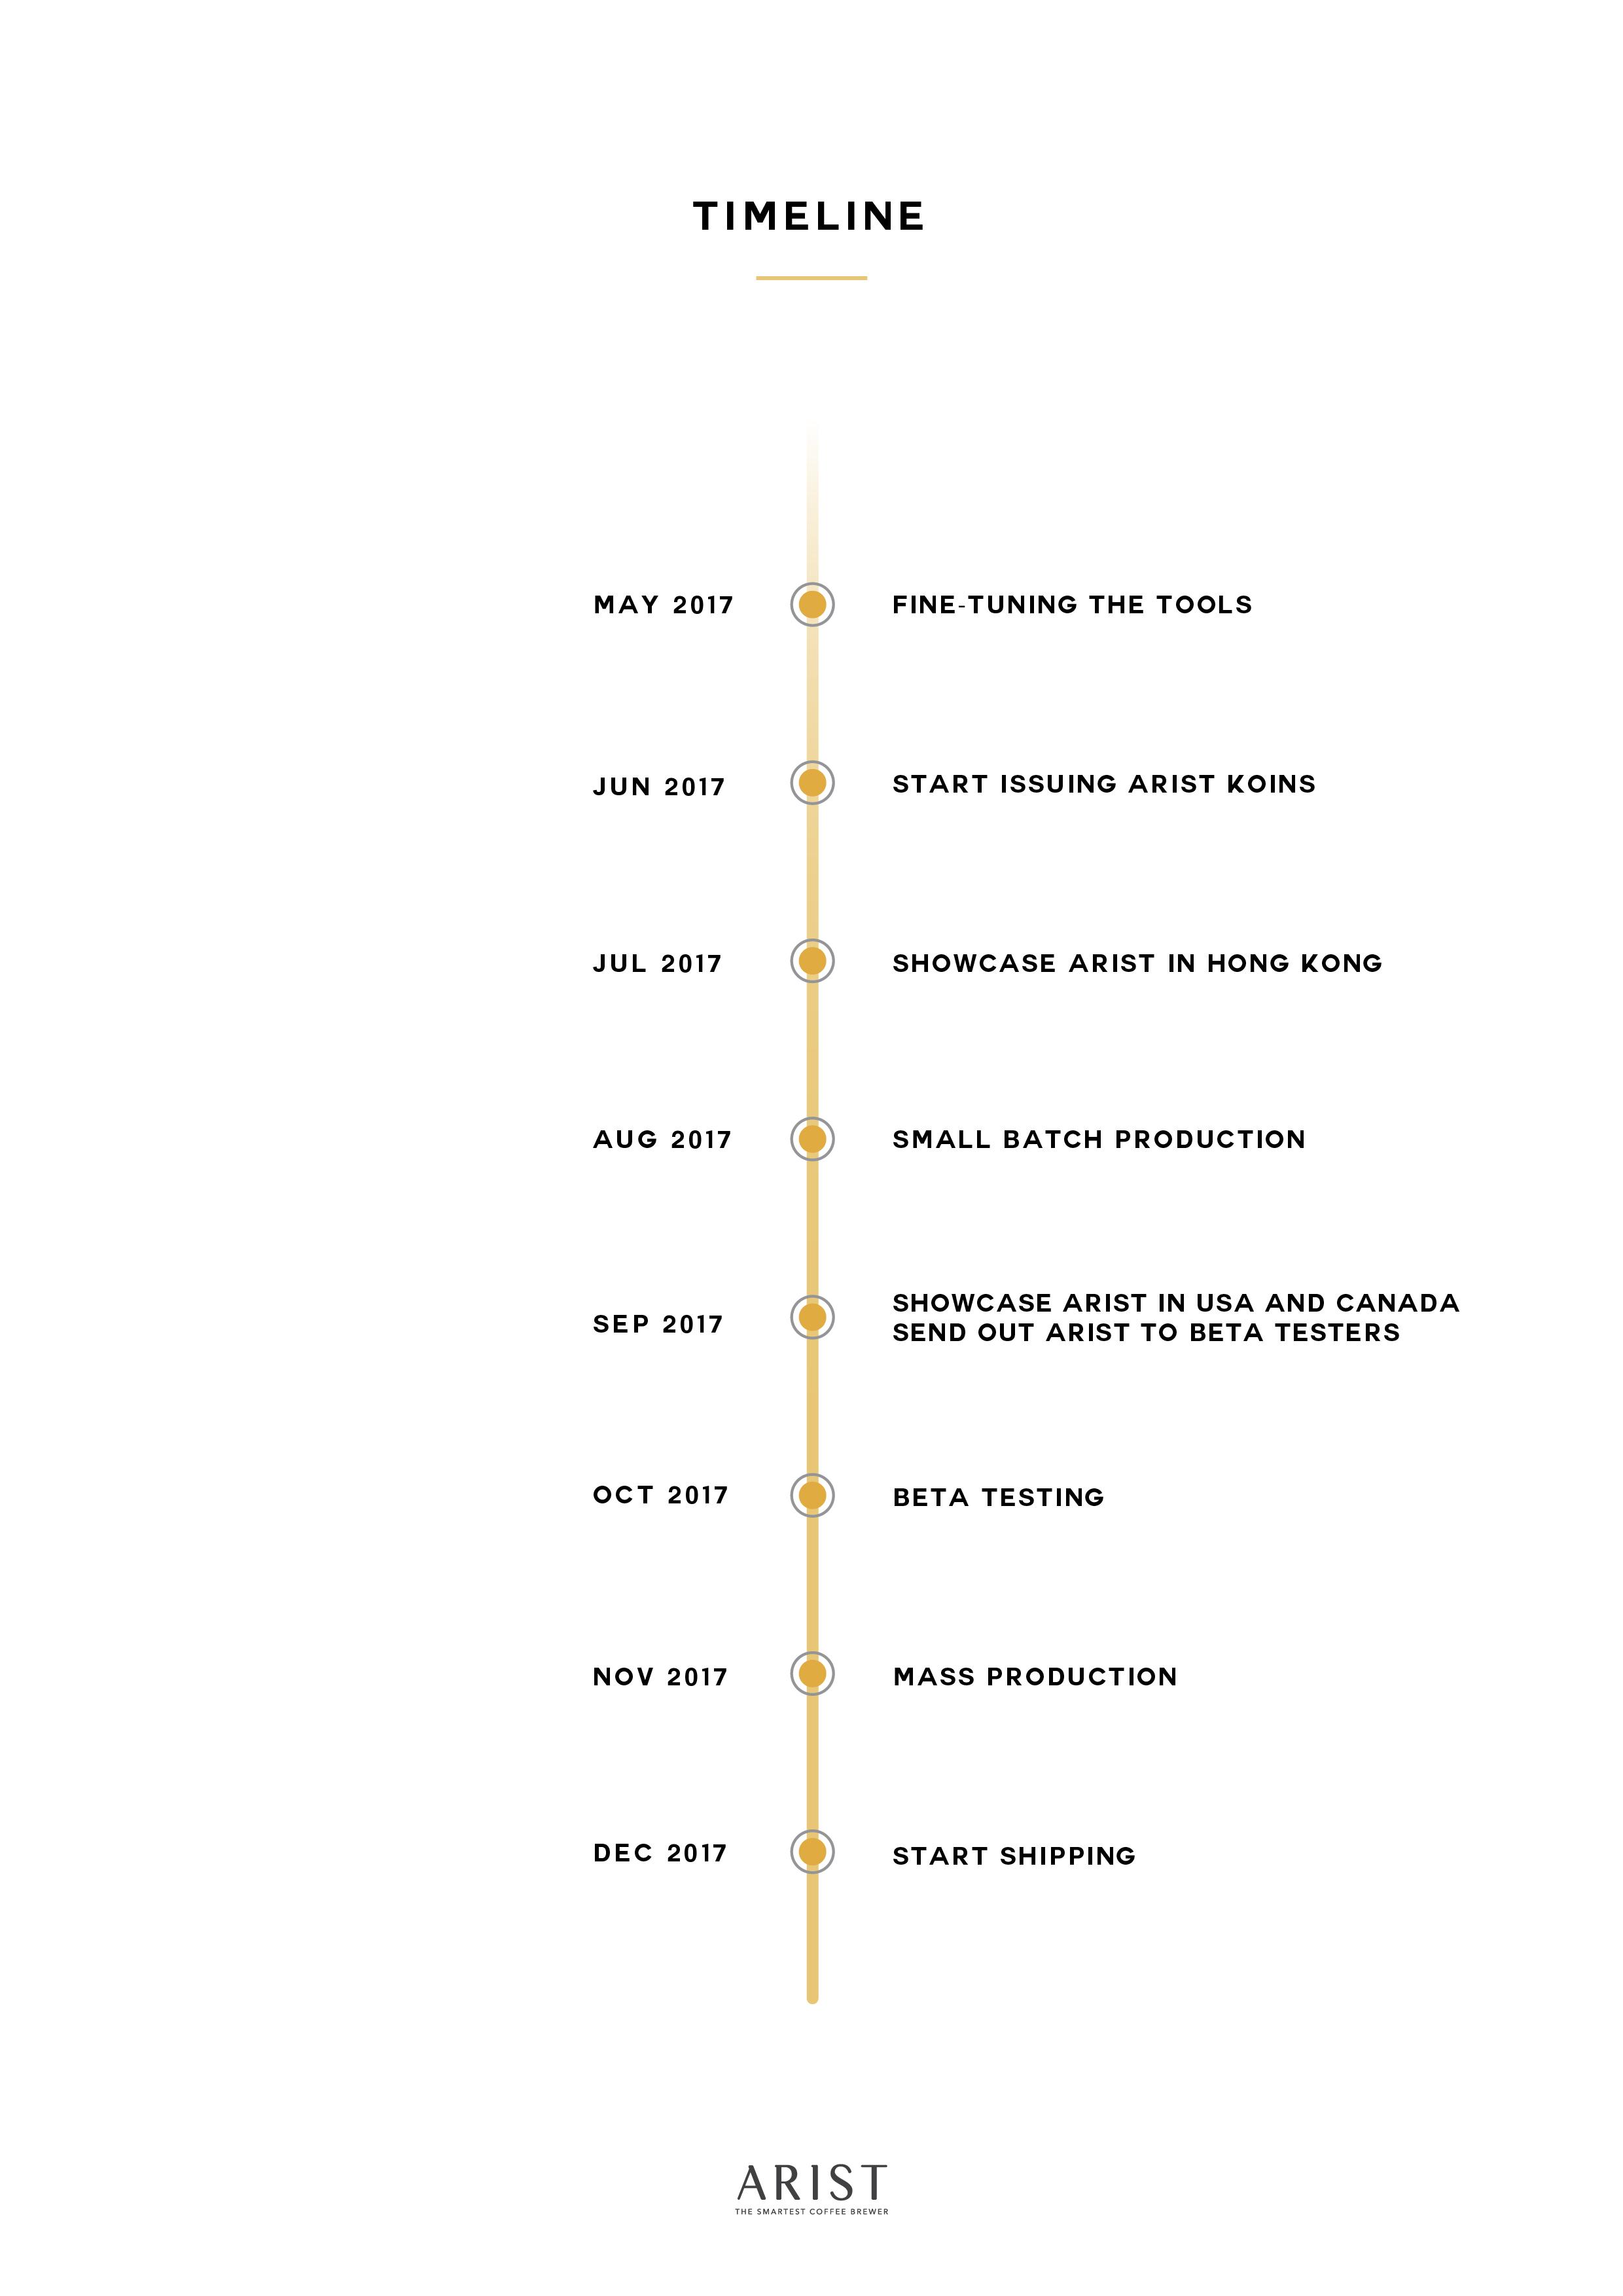 Updated timeline